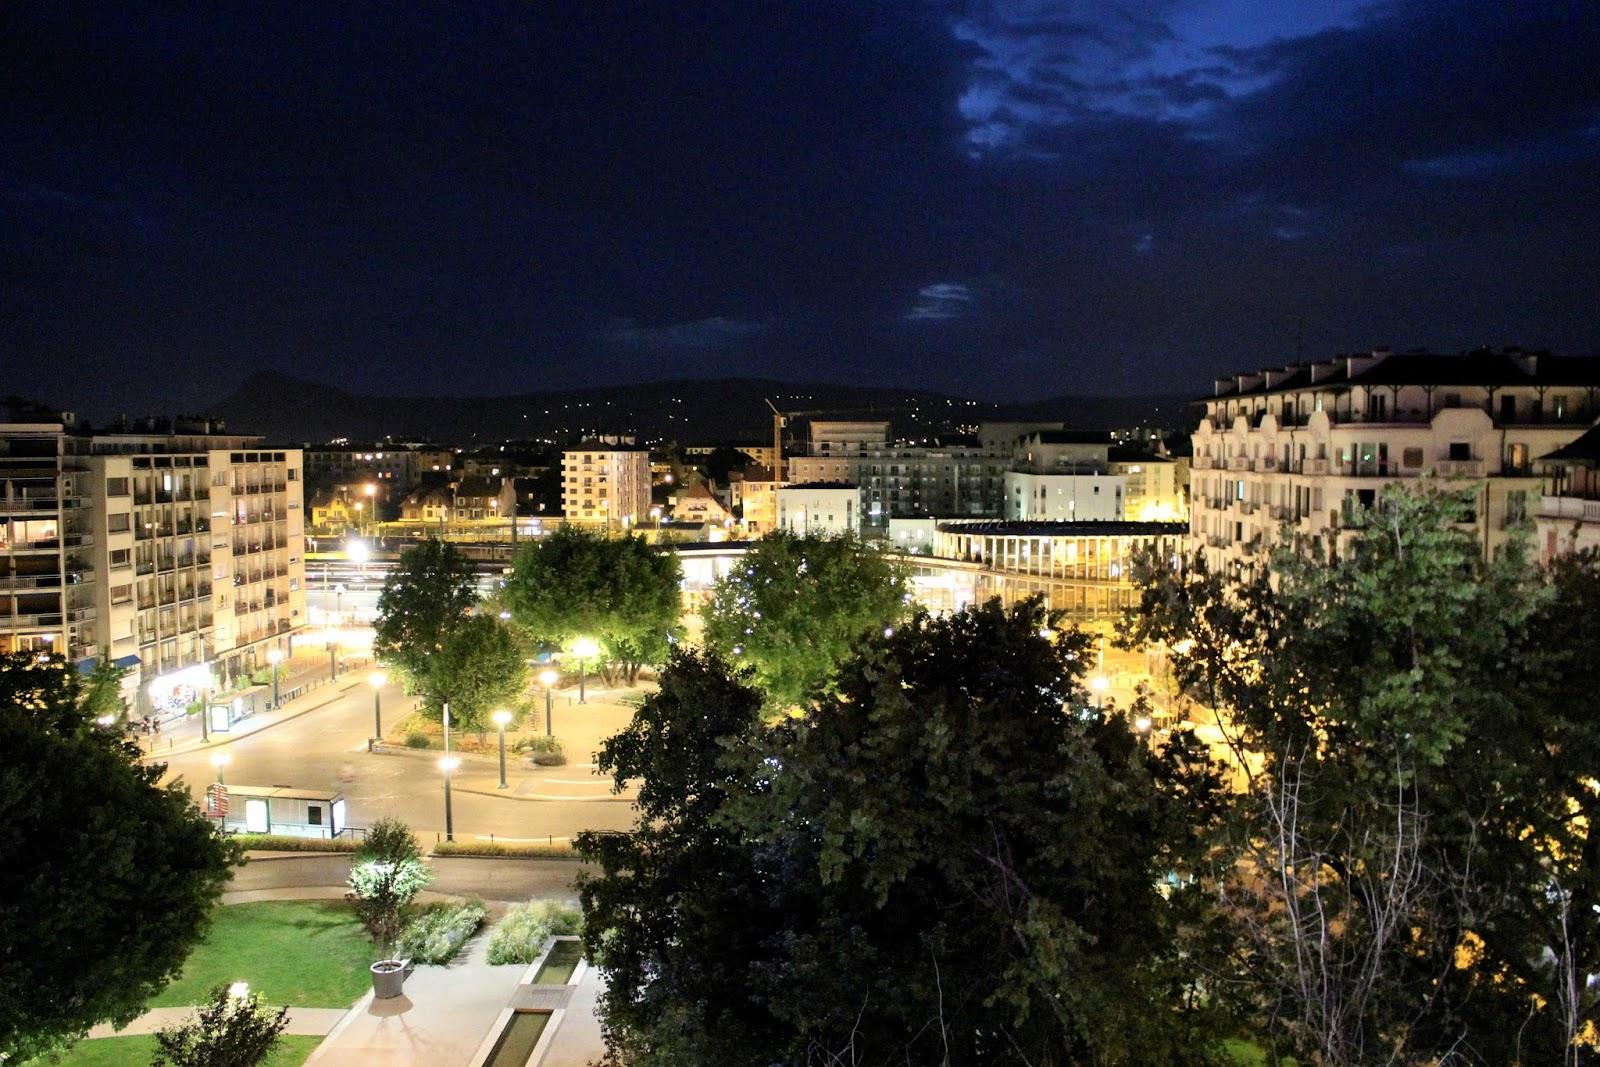 Best Western Hotel Carlton Annecy nighttime balcony view